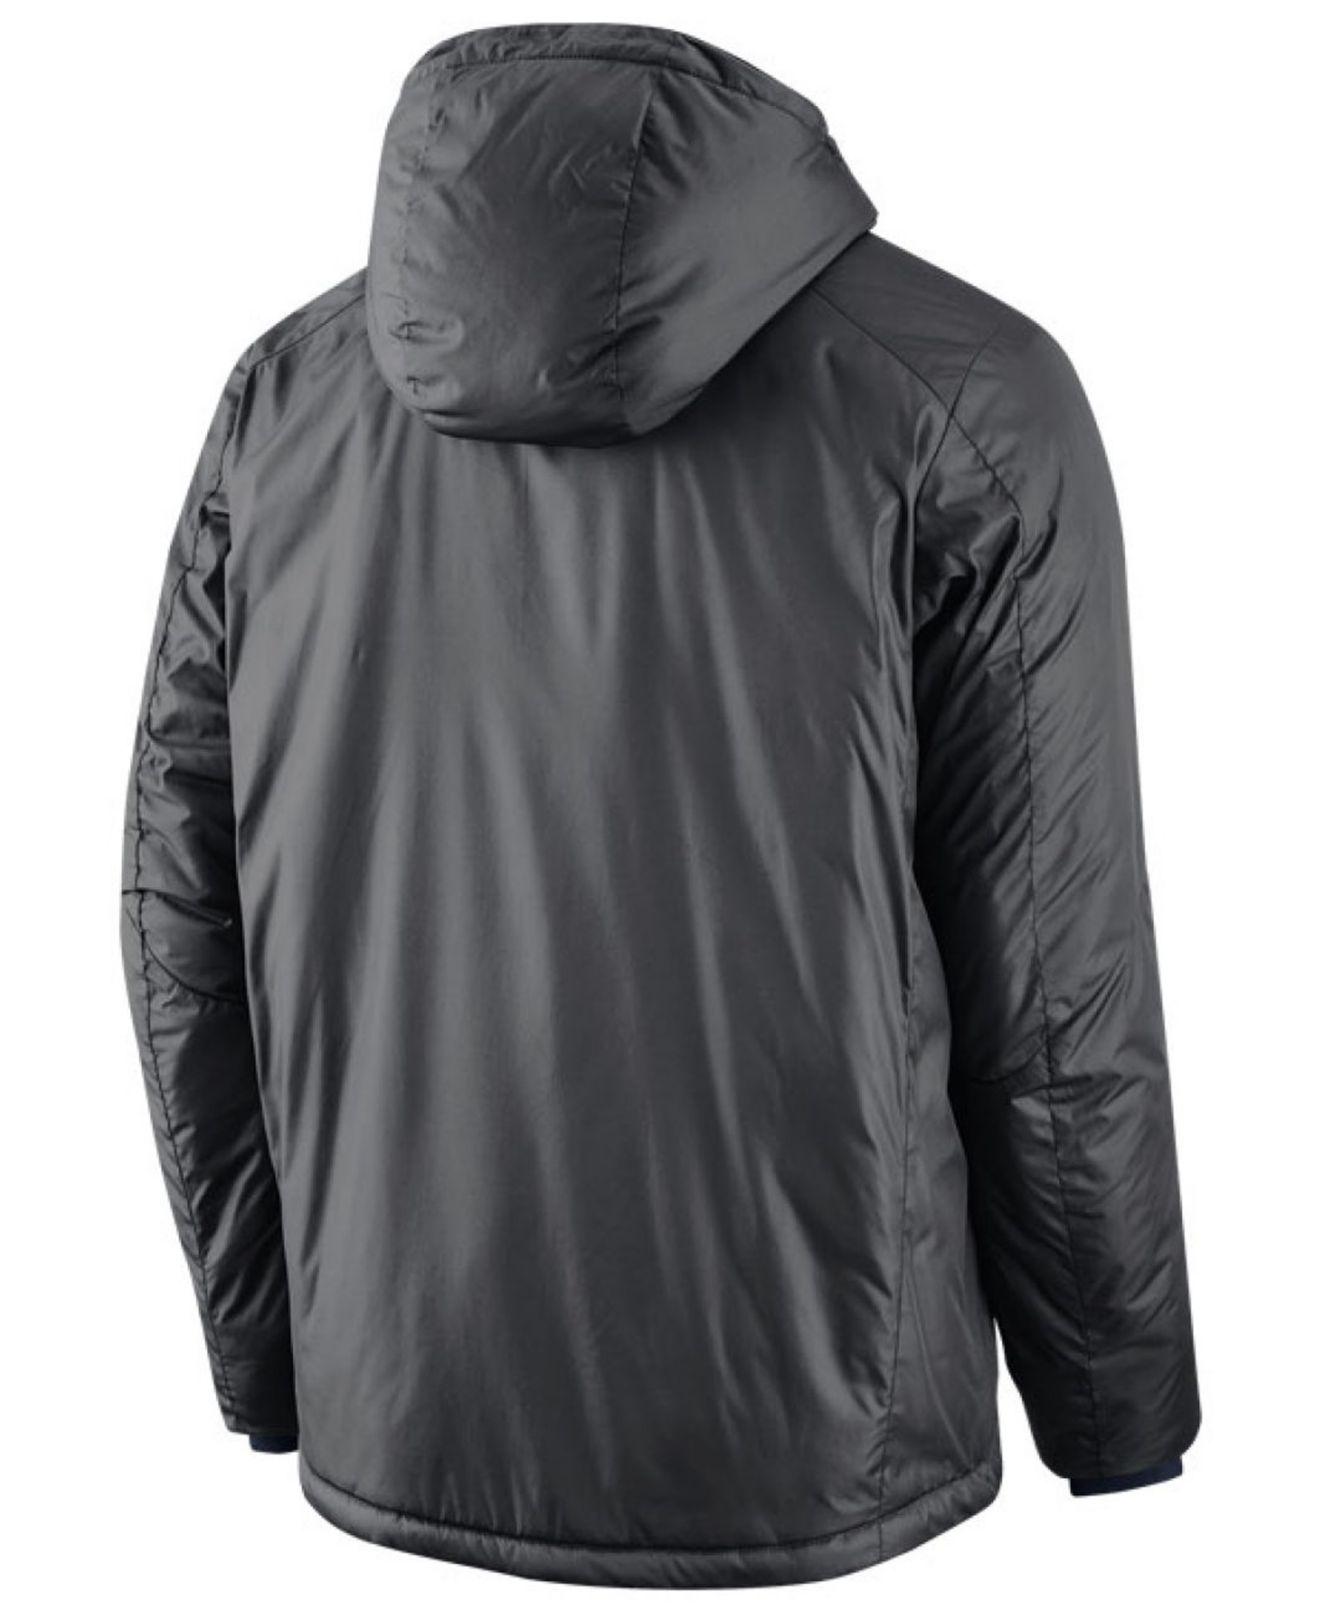 North Face Jackets Macy S